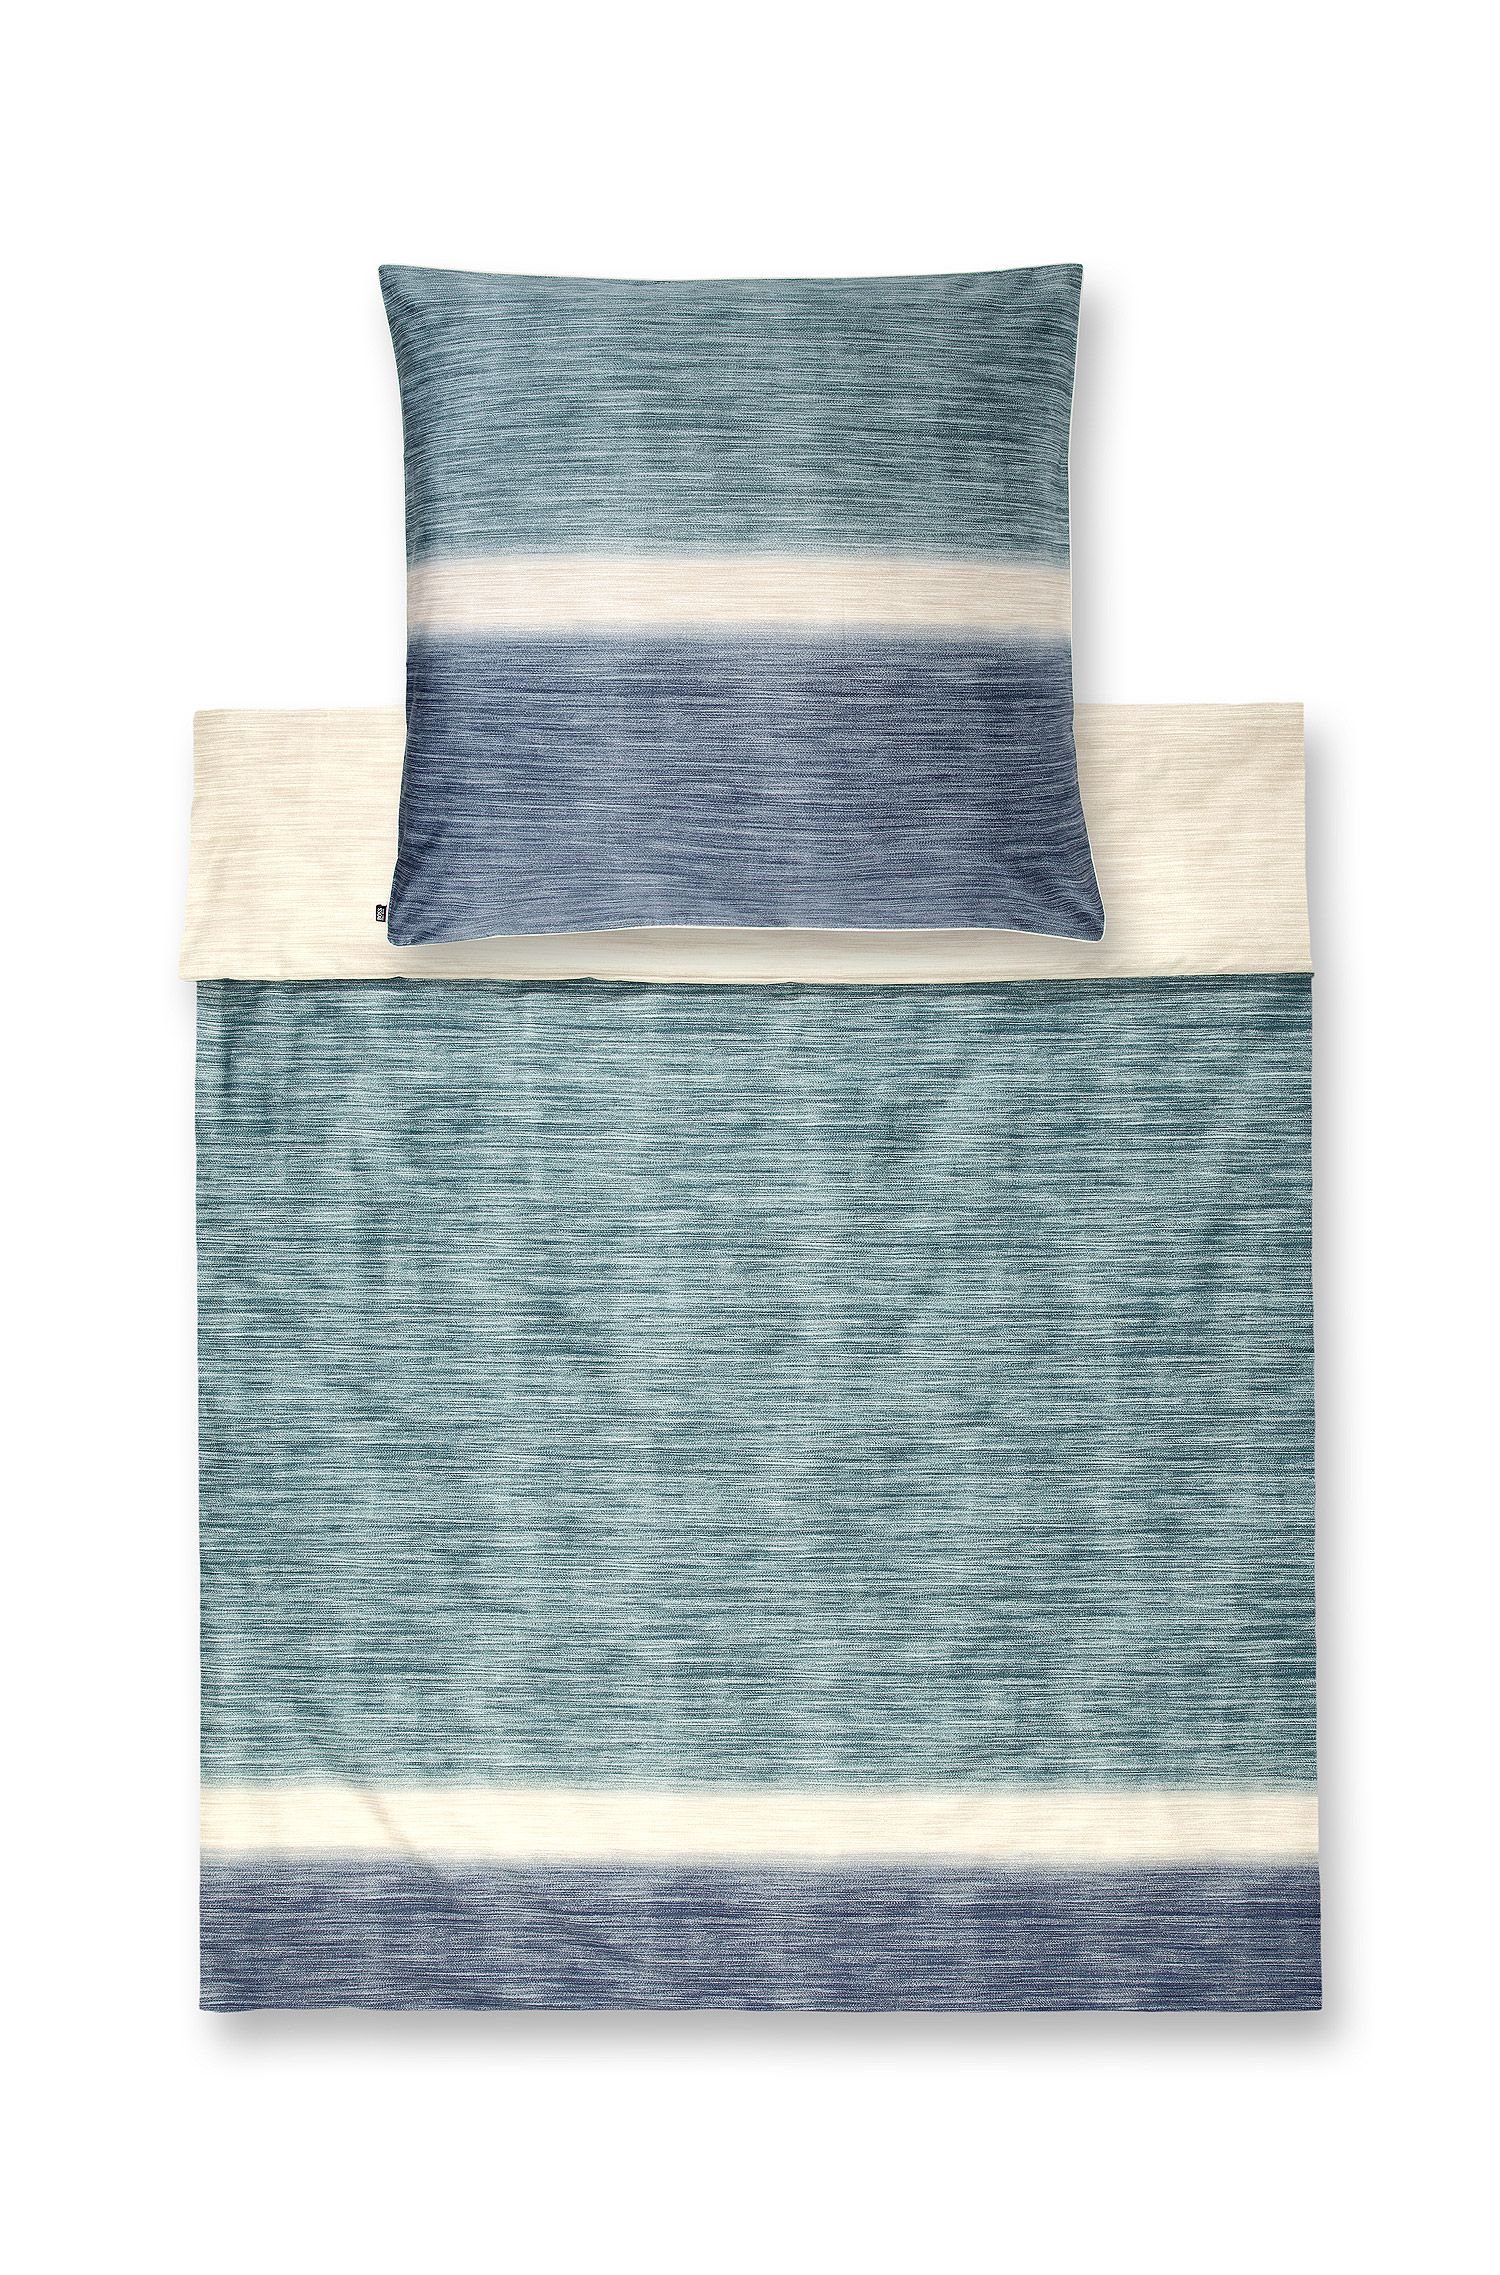 Bettdeckenbezug ´SWELL` aus Baumwollsatin